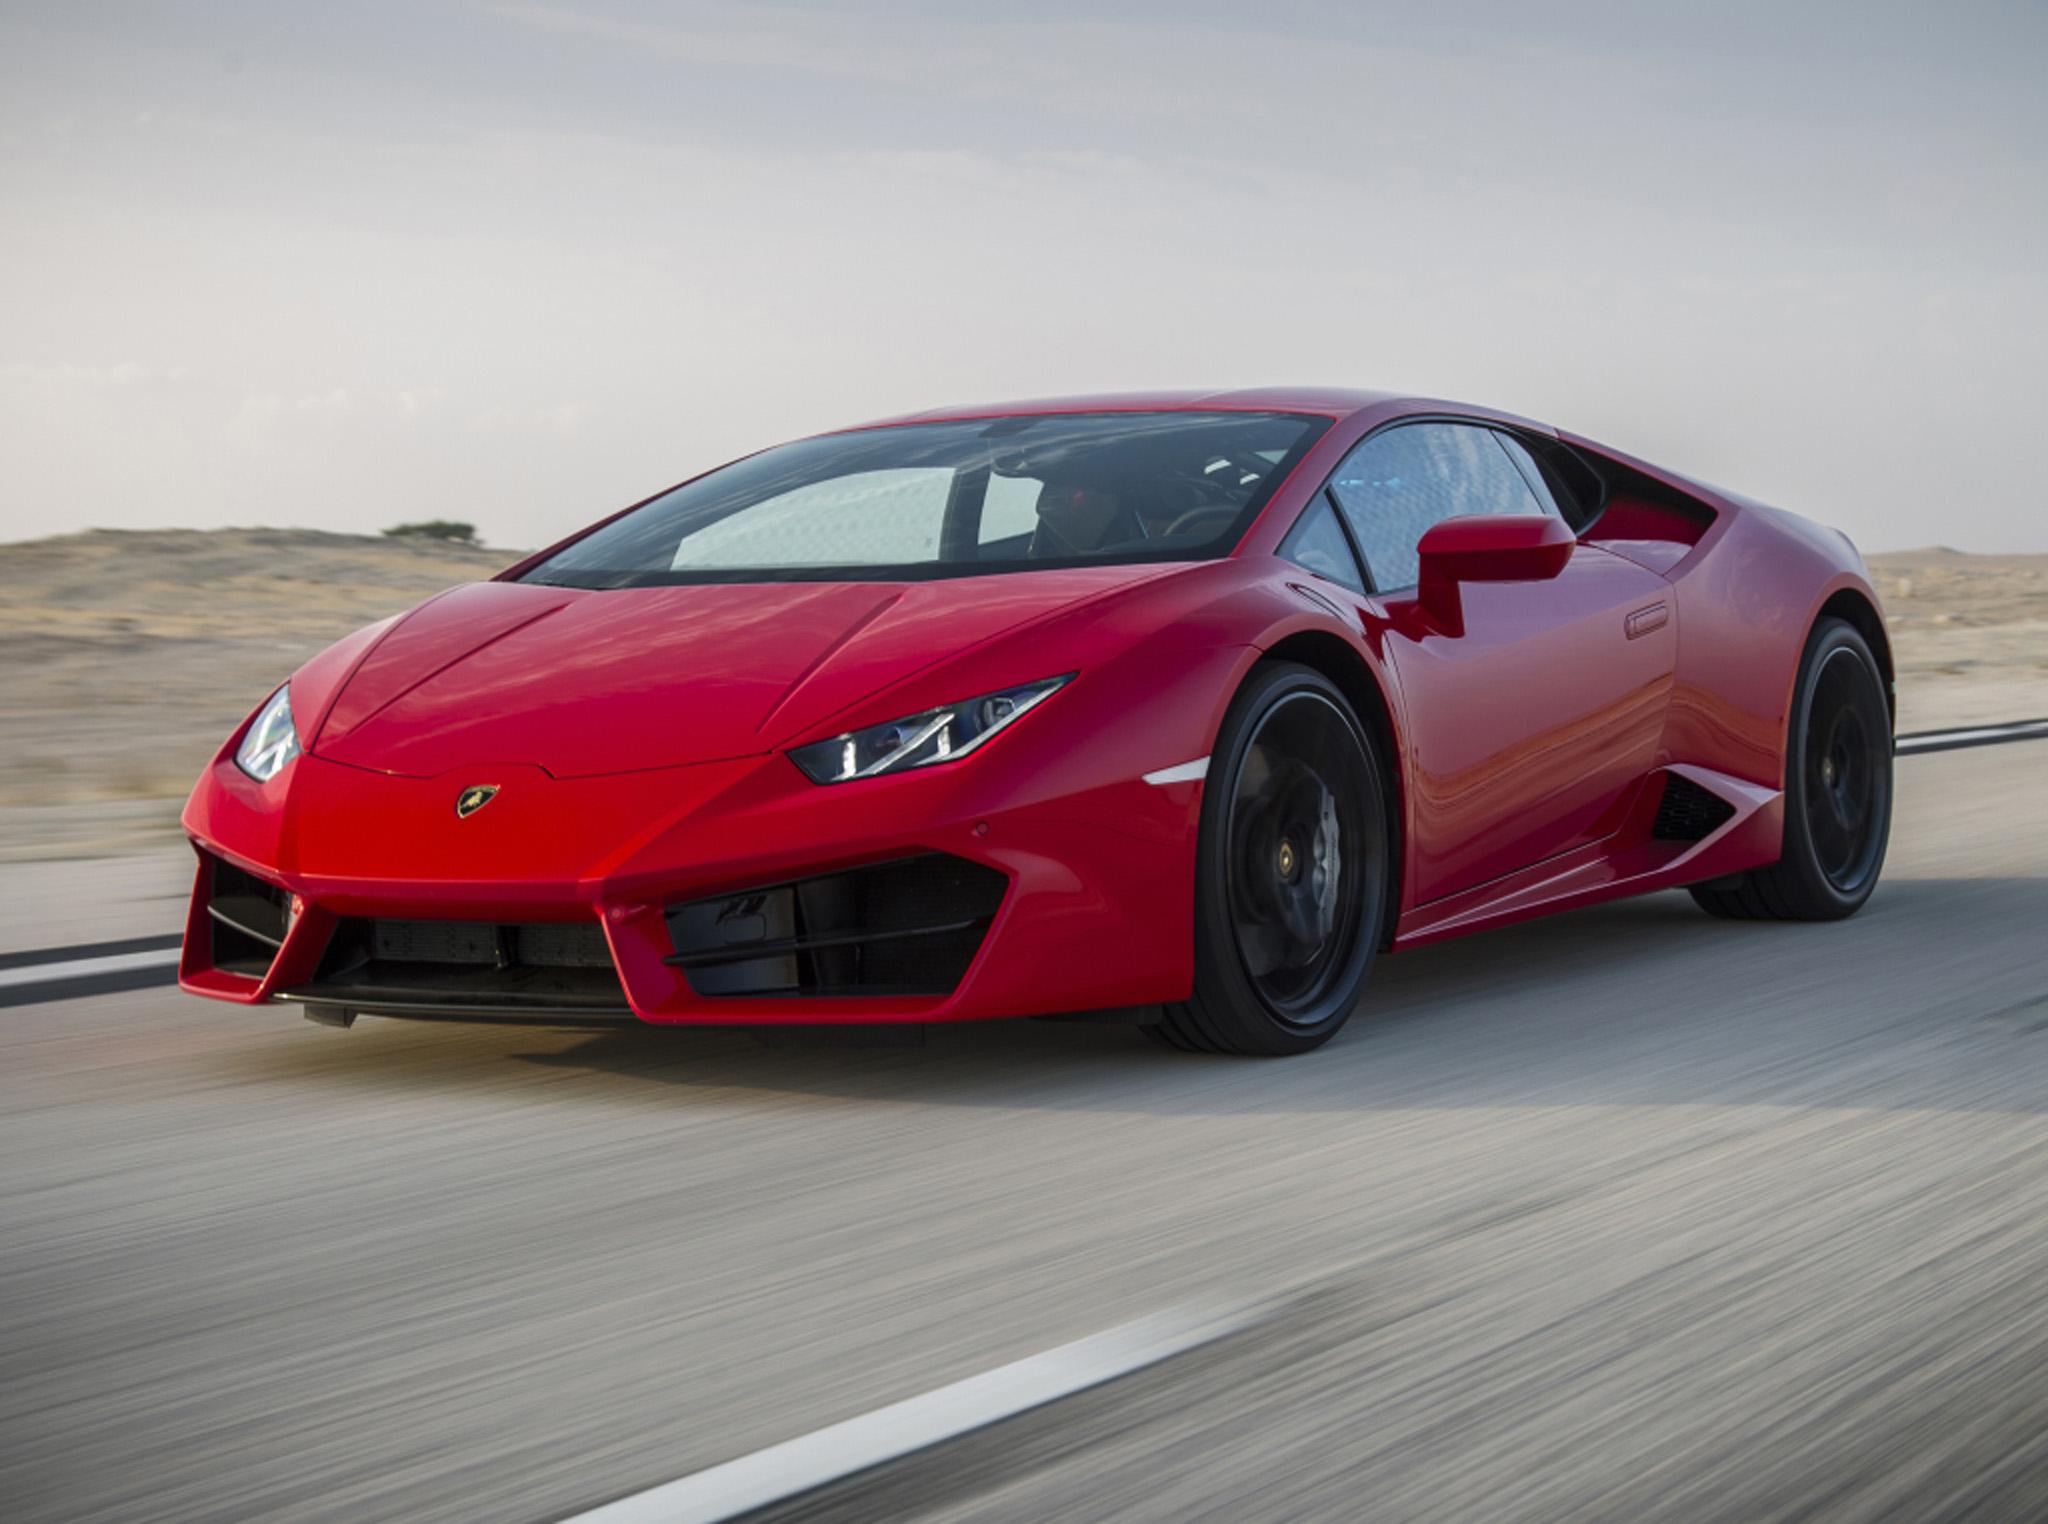 Lamborghini aventador lp750-4 superveloce coup0e9 is getting a roadster twin